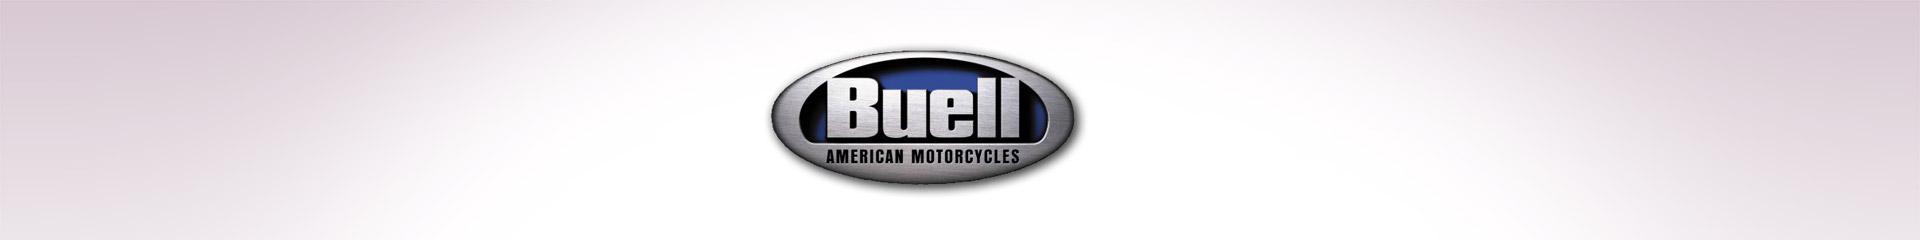 Ricambi Moto Buell